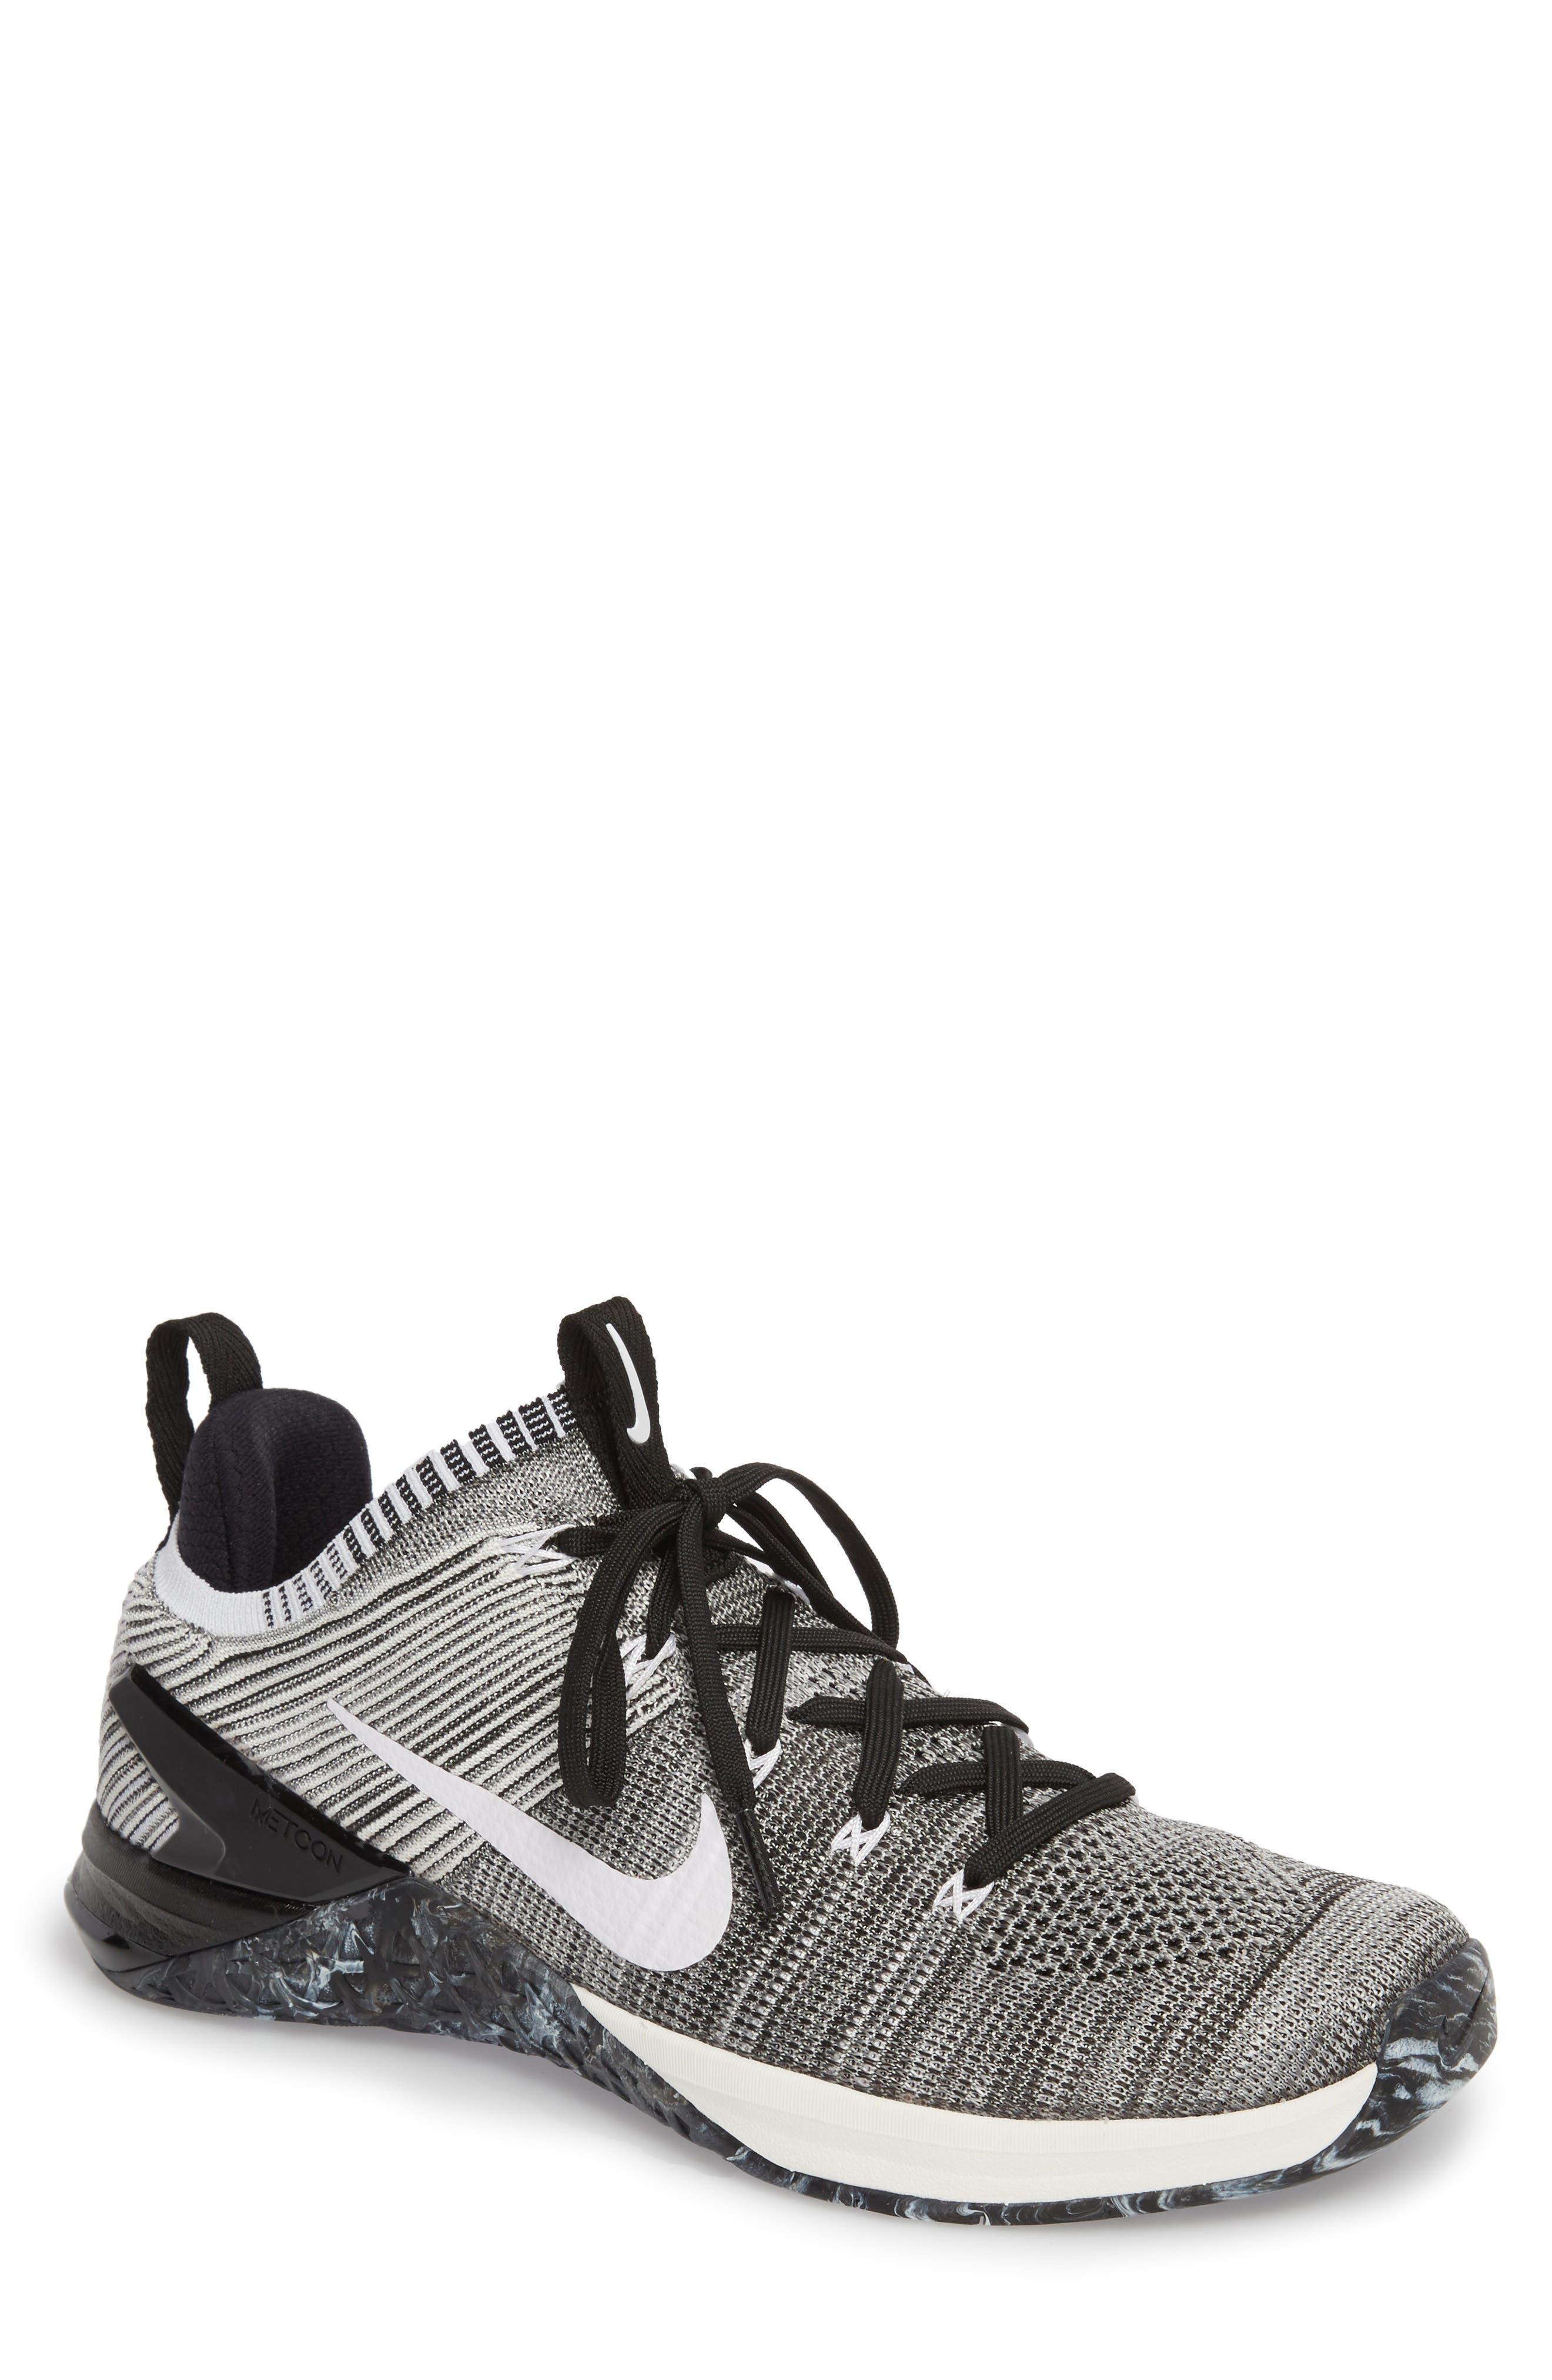 Alternate Image 1 Selected - Nike Metcon DSX Flyknit 2 Training Shoe (Men)